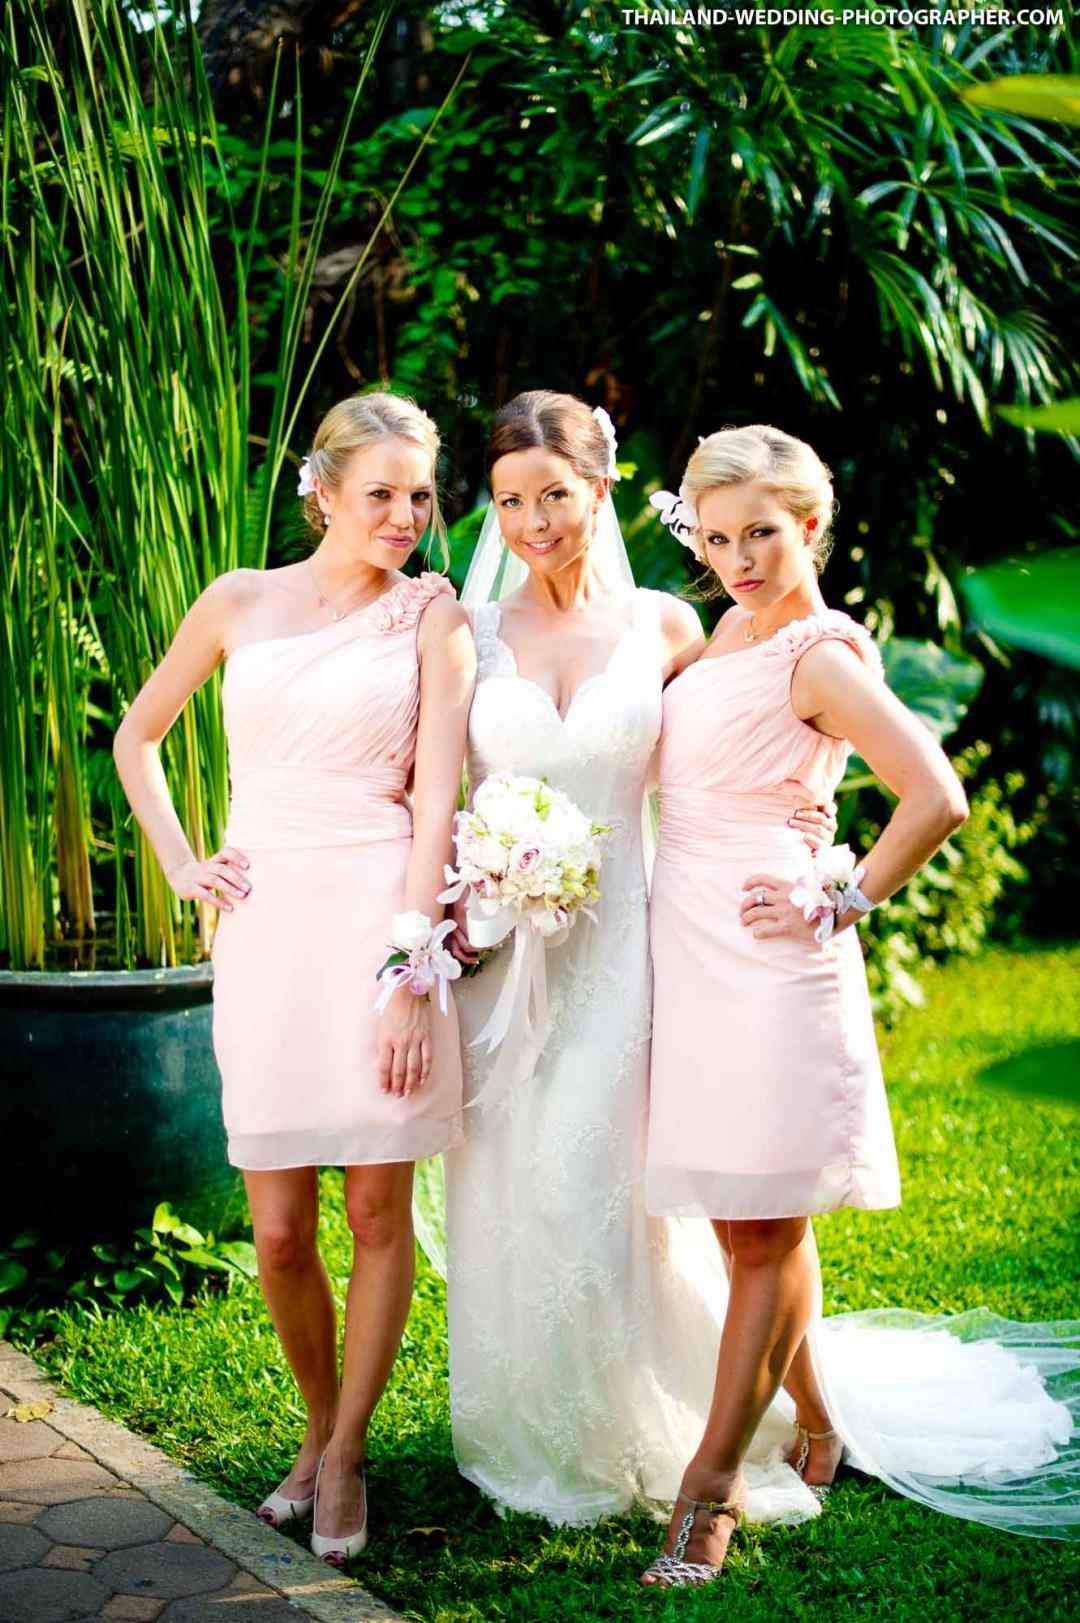 Chakrabongse Villas Bangkok Thailand Wedding Photography